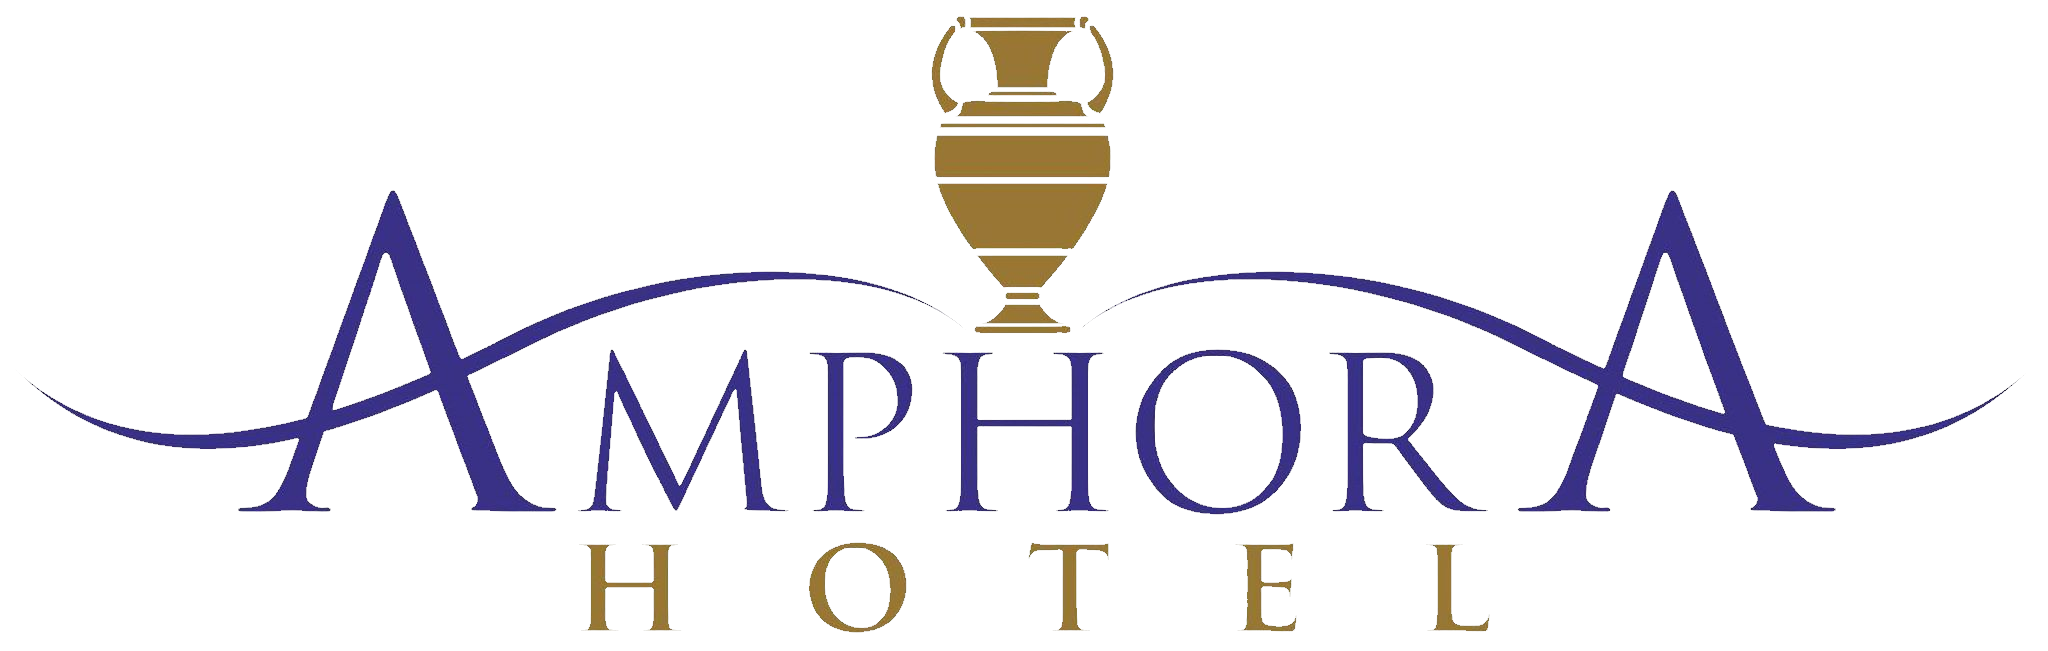 Amphora Hotel | Kaş | Antalya | Antalya Butik Otel | Kaş Butik Otel